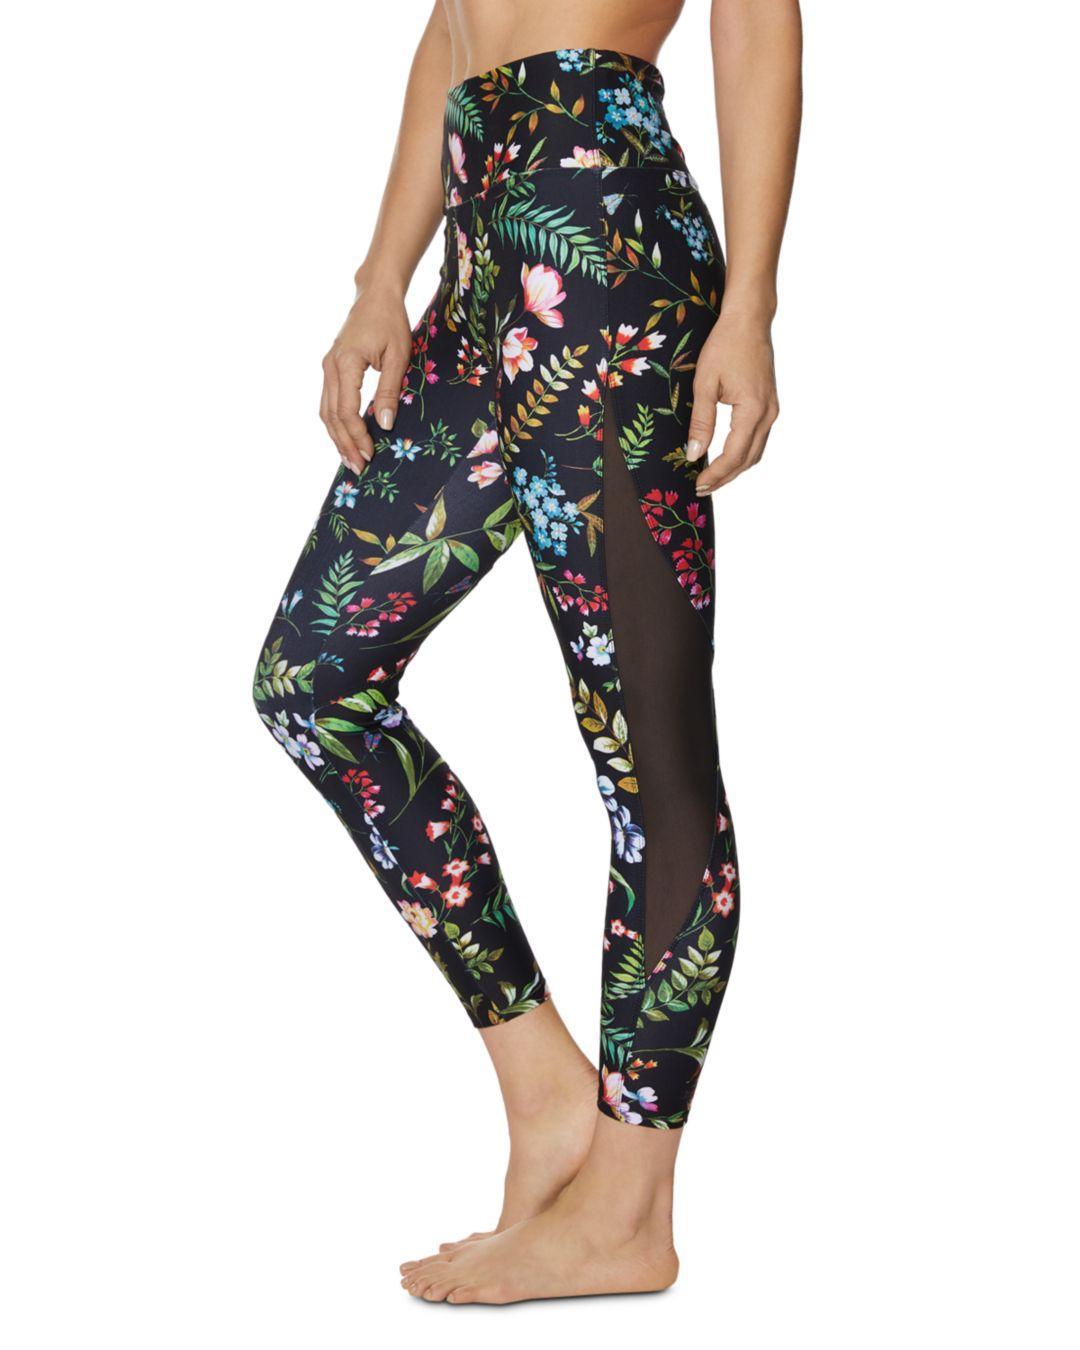 af91210f6cbaaf Lyst - Betsey Johnson Mesh-inset Botanical Jersey Leggings in Black